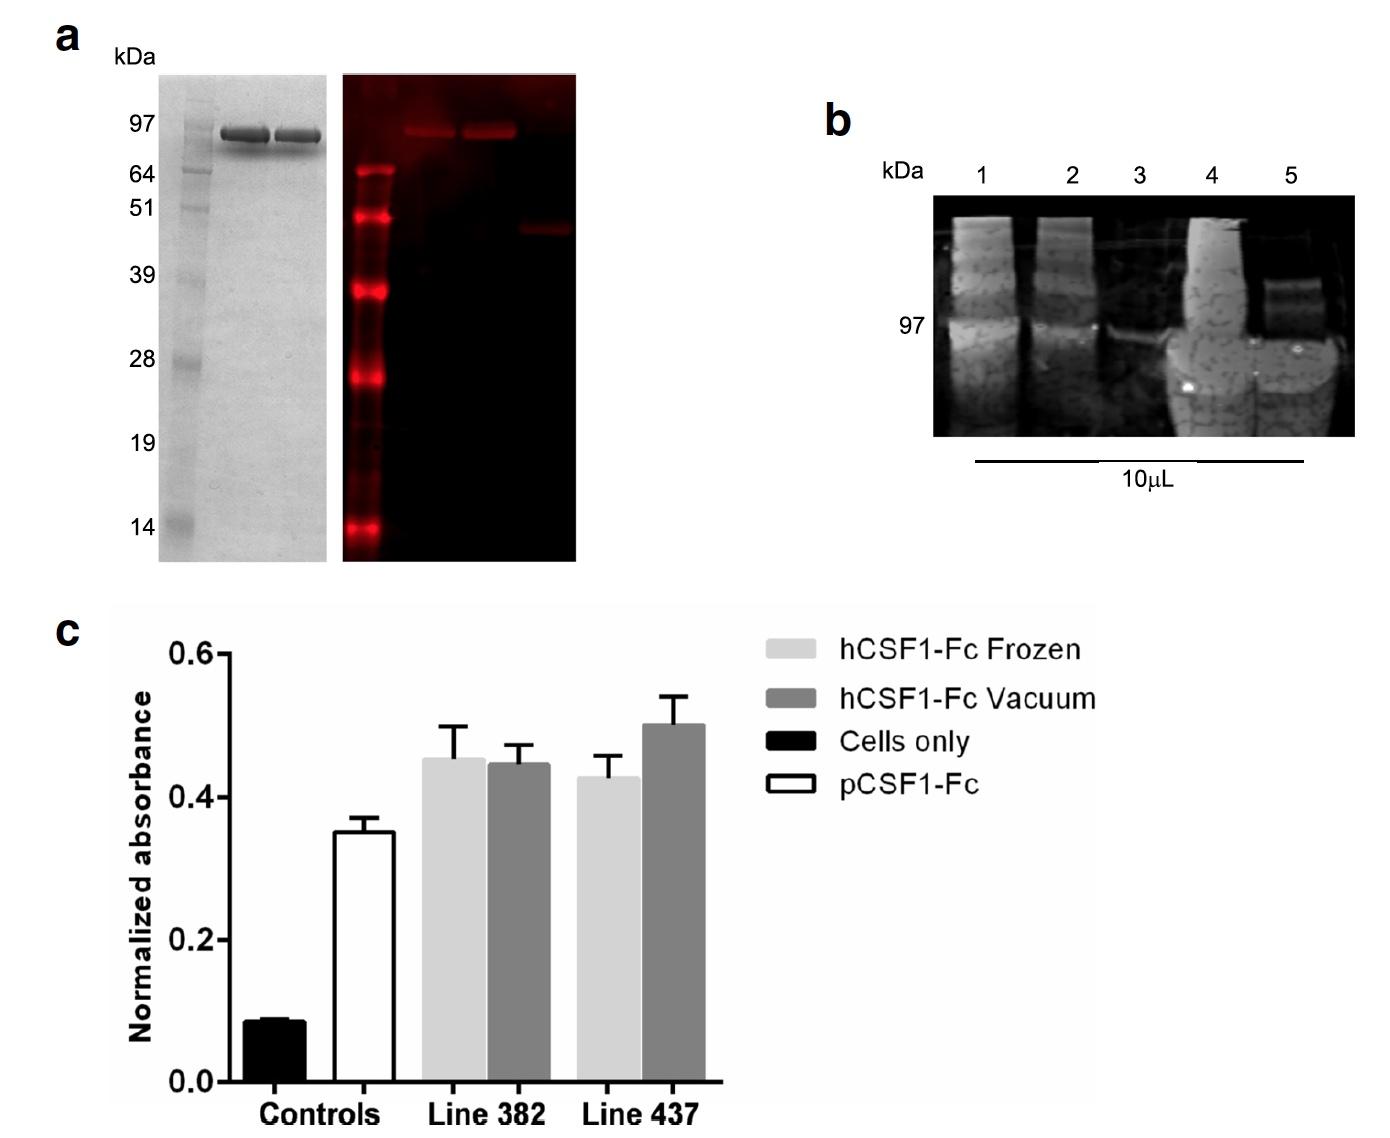 Генетика и куры: белок CSF1-Fc человека в яичном белке - 5